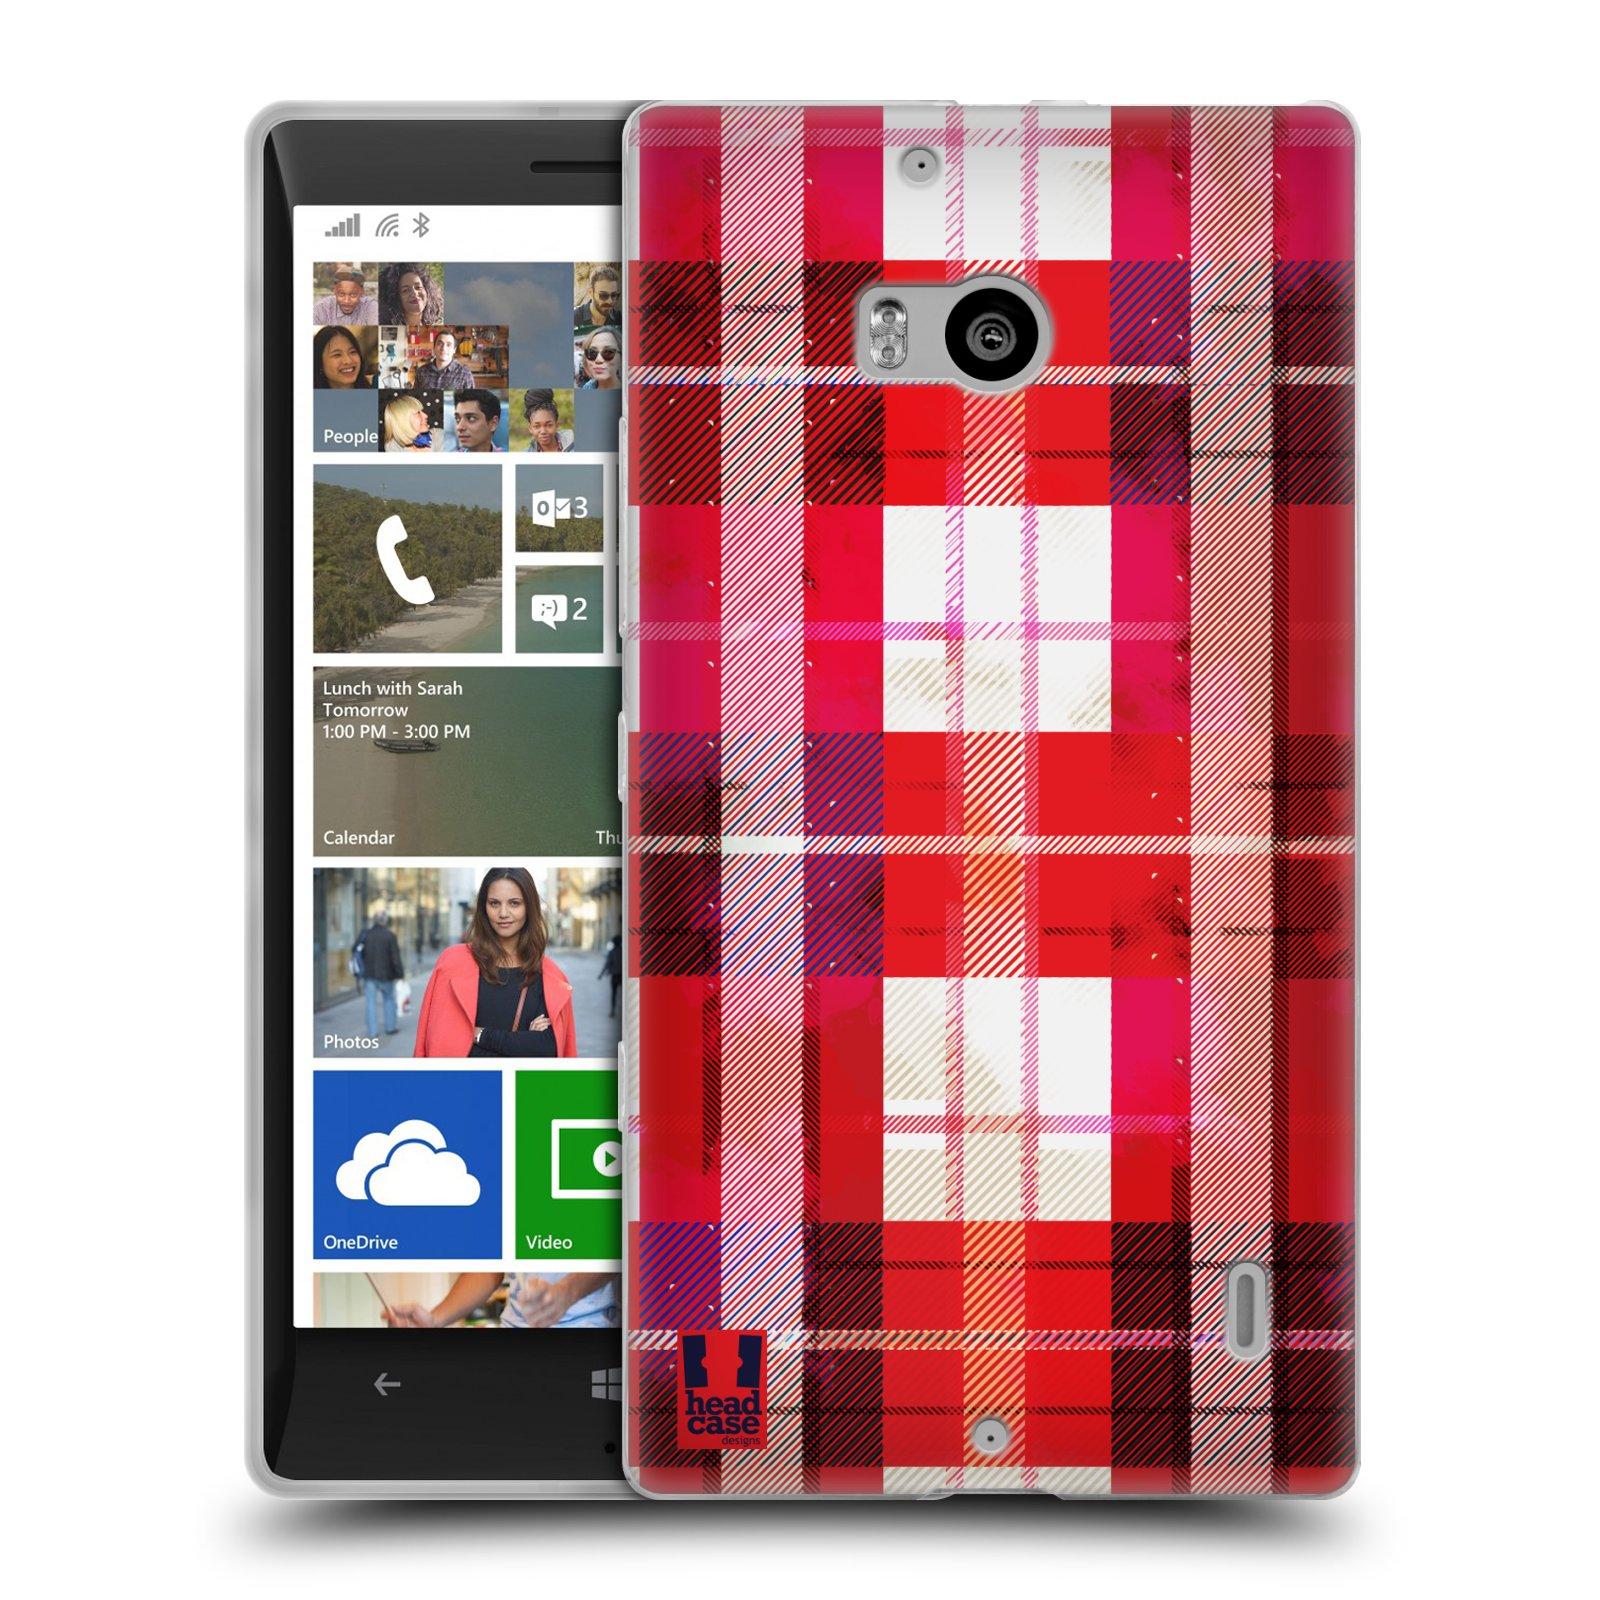 Silikonové pouzdro na mobil Nokia Lumia 930 HEAD CASE FLANEL RED (Silikonový kryt či obal na mobilní telefon Nokia Lumia 930)